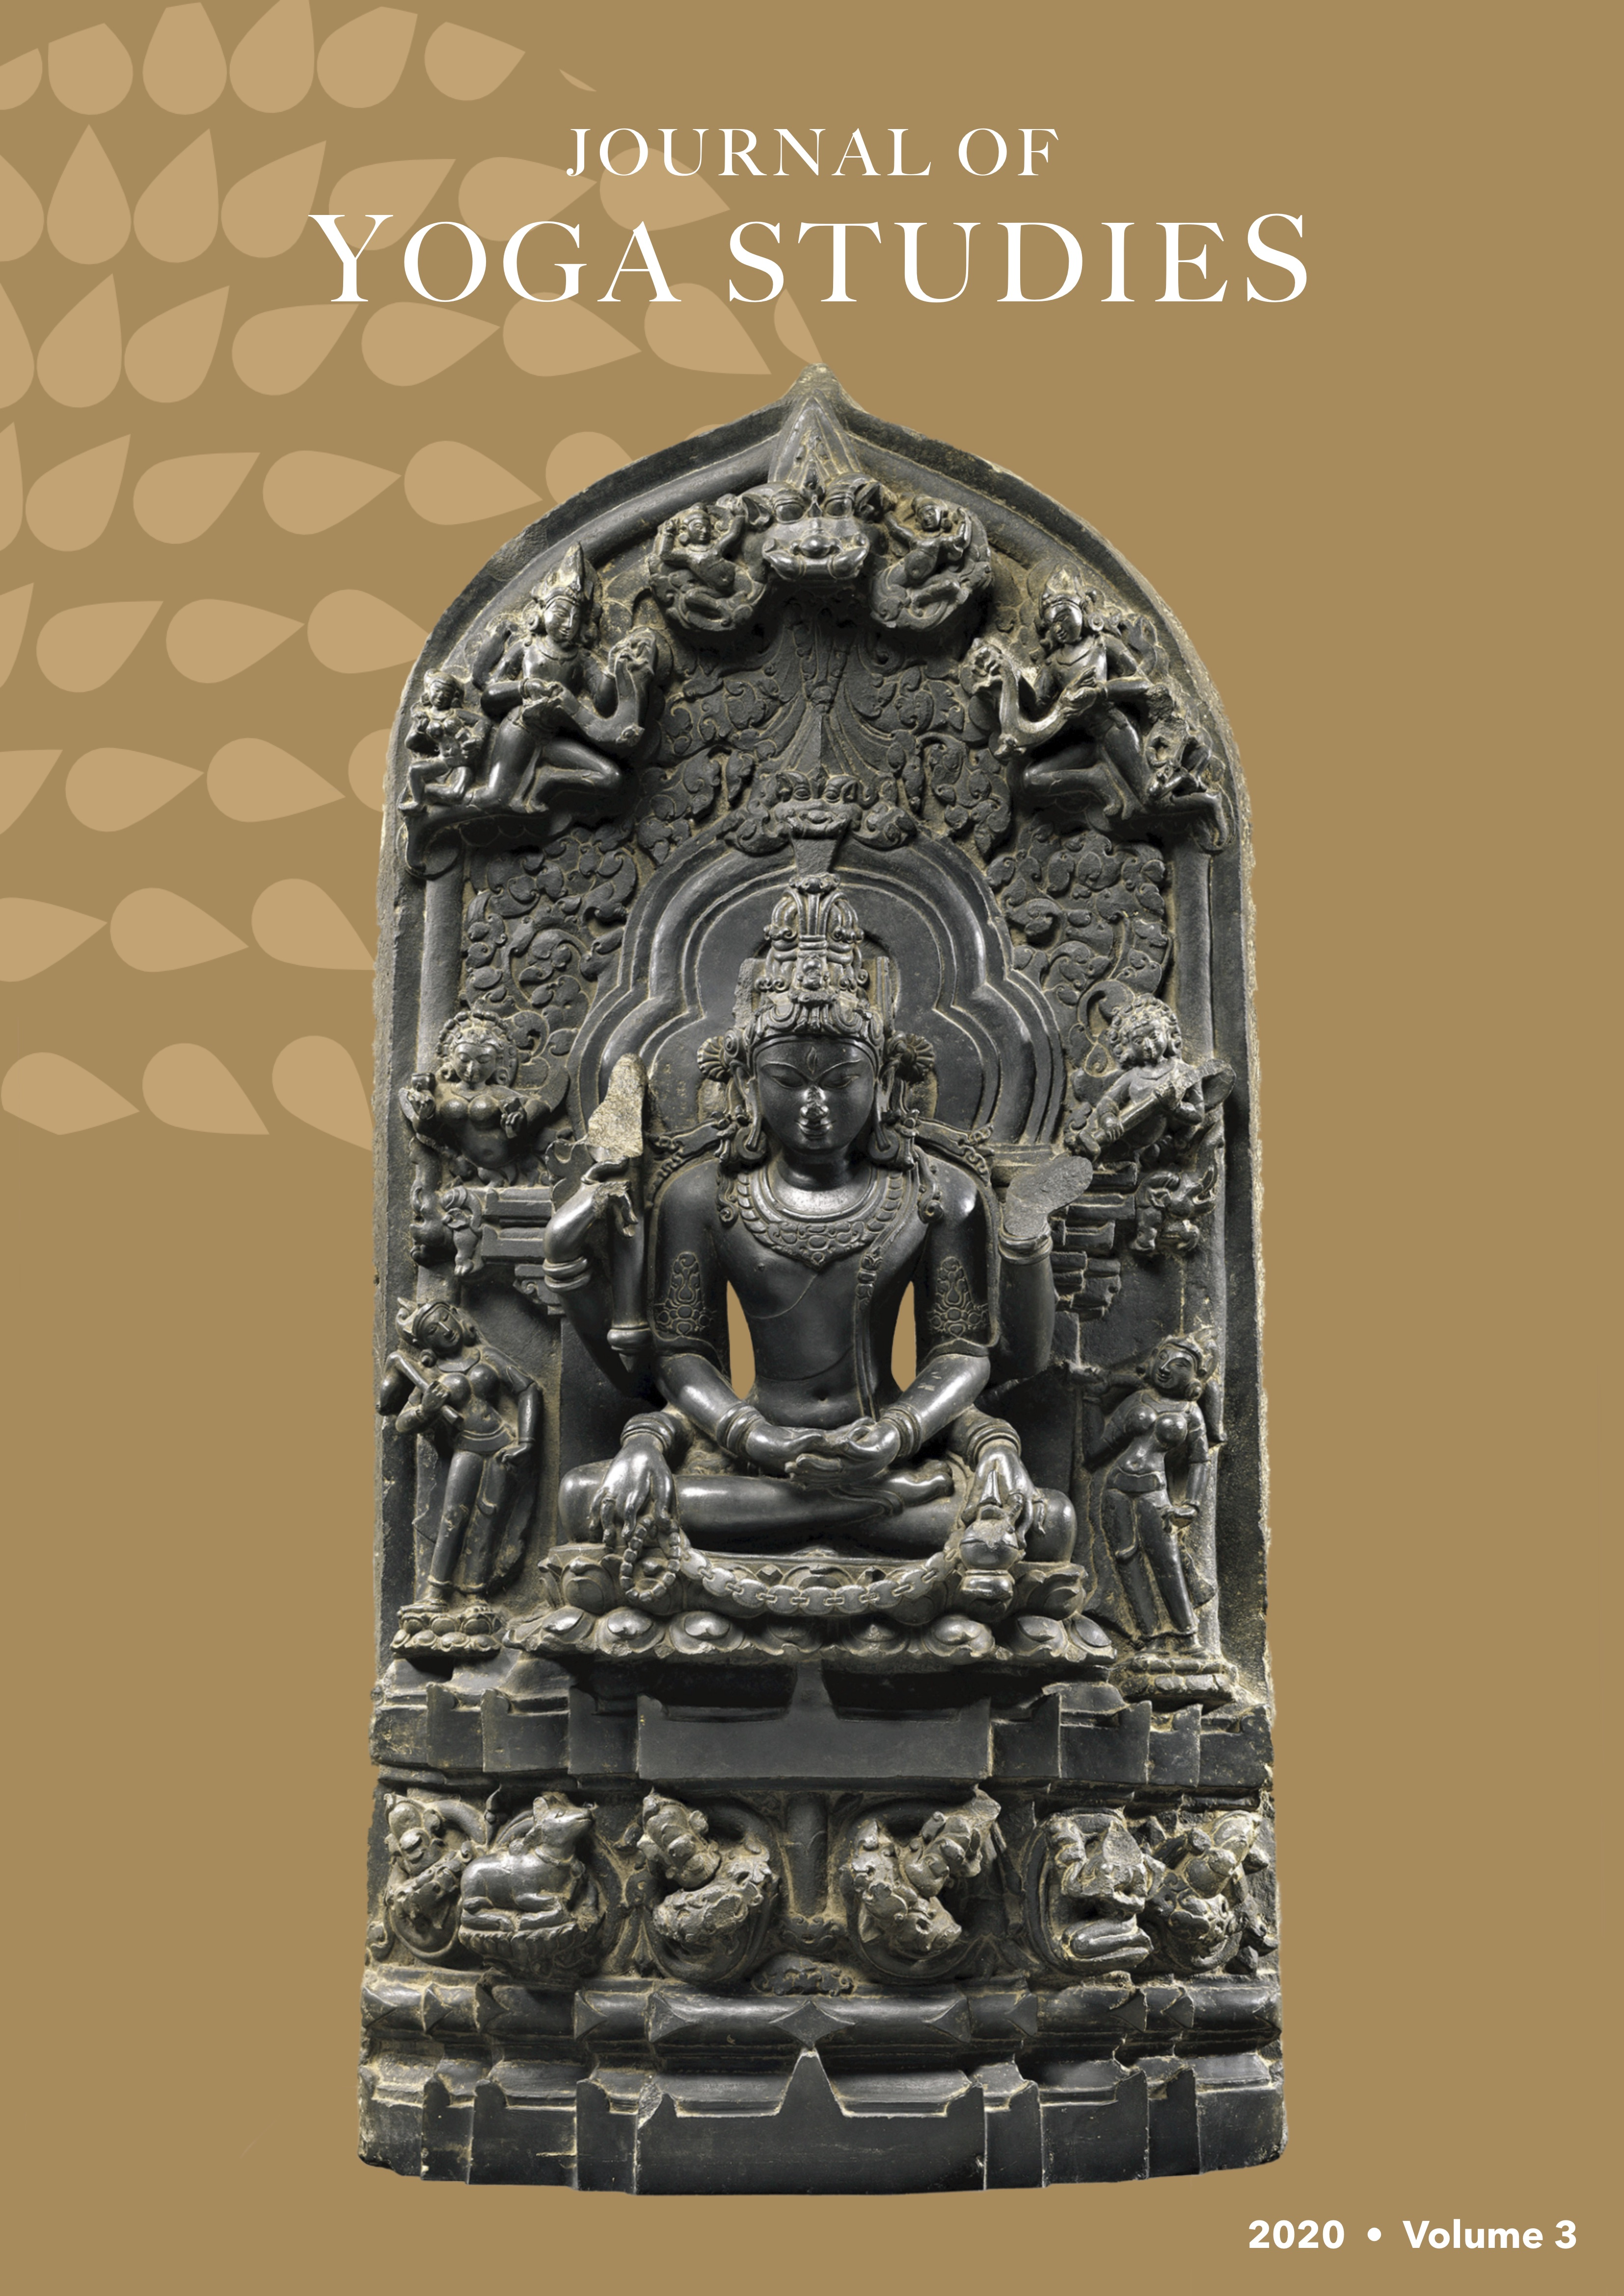 Journal of Yoga Studies | 2020 • Volume 3